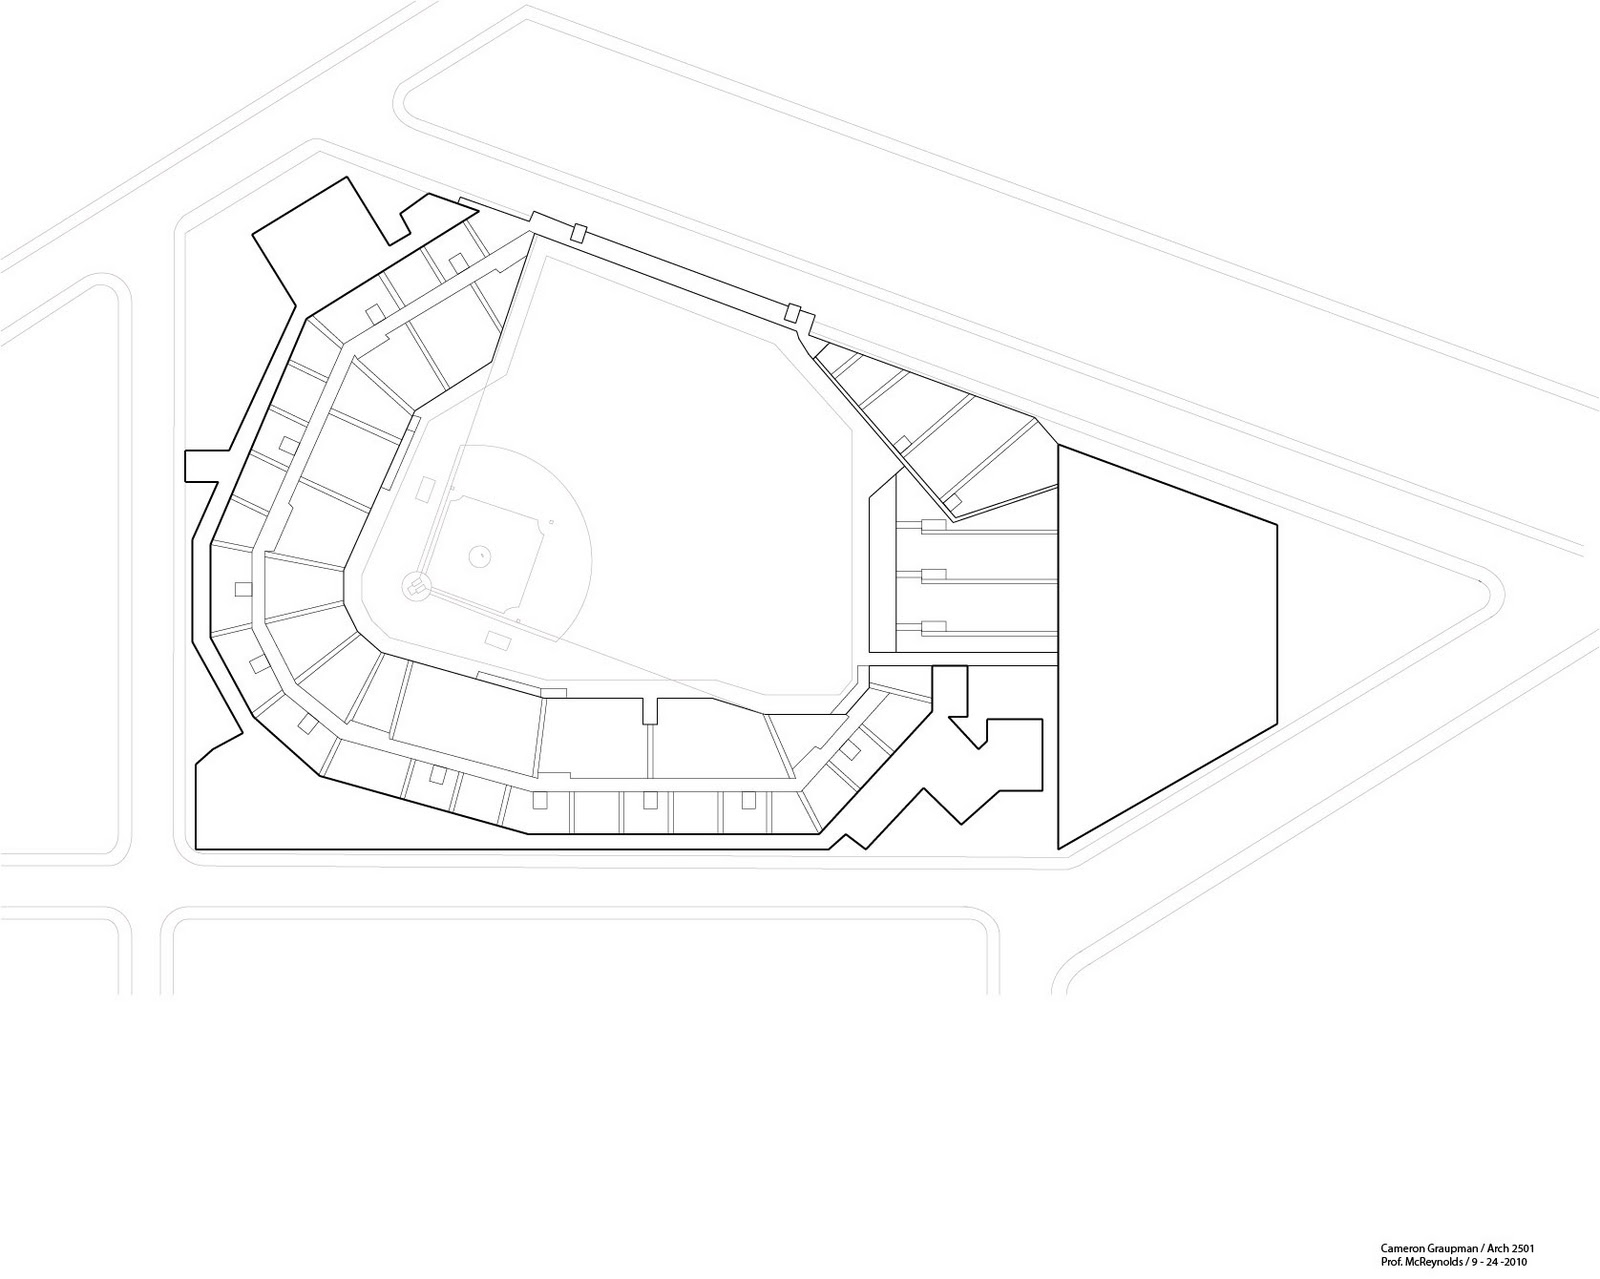 cgraupman2501  fenway park plan